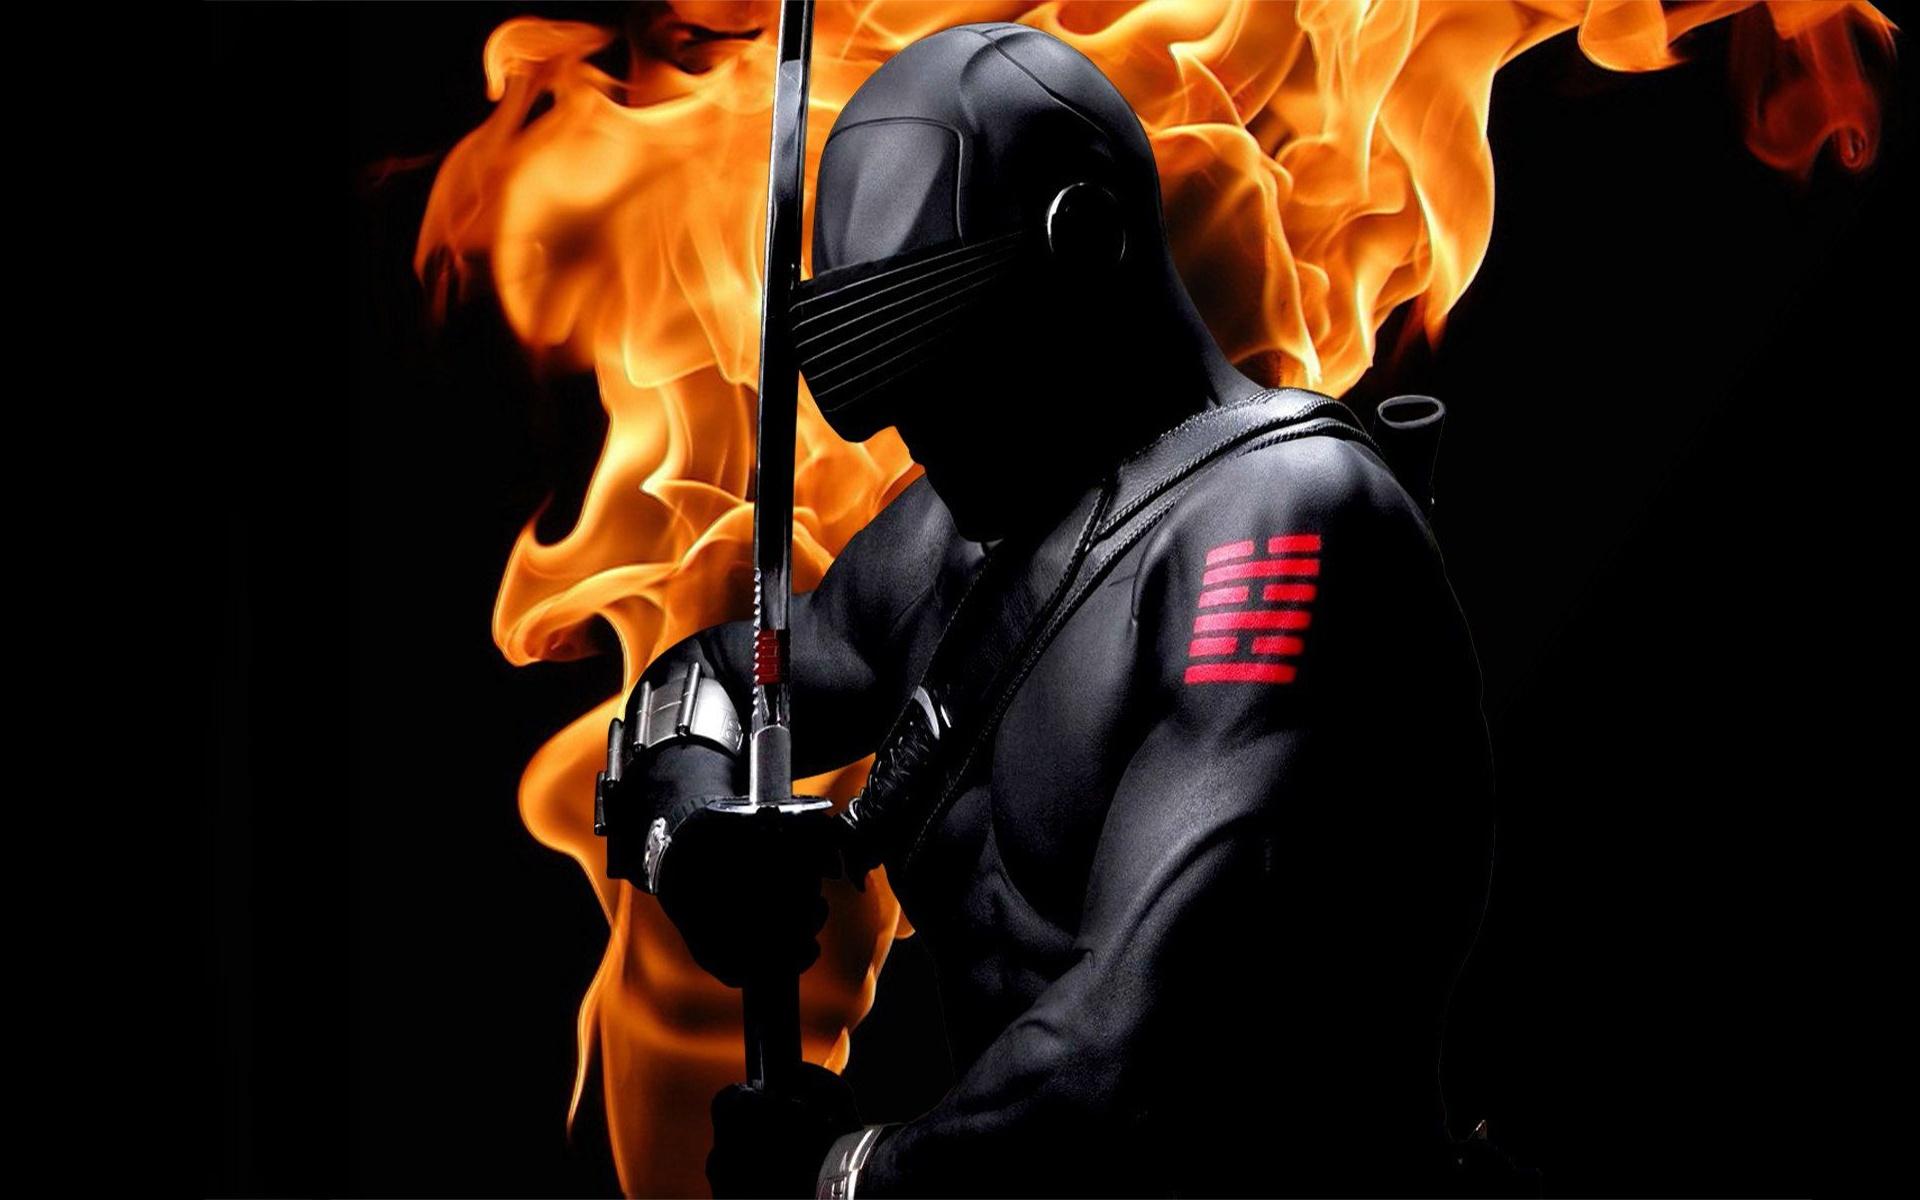 ninja asian oriental weapons swords fire flames warriors wallpaper    Ninja Weapons Wallpaper